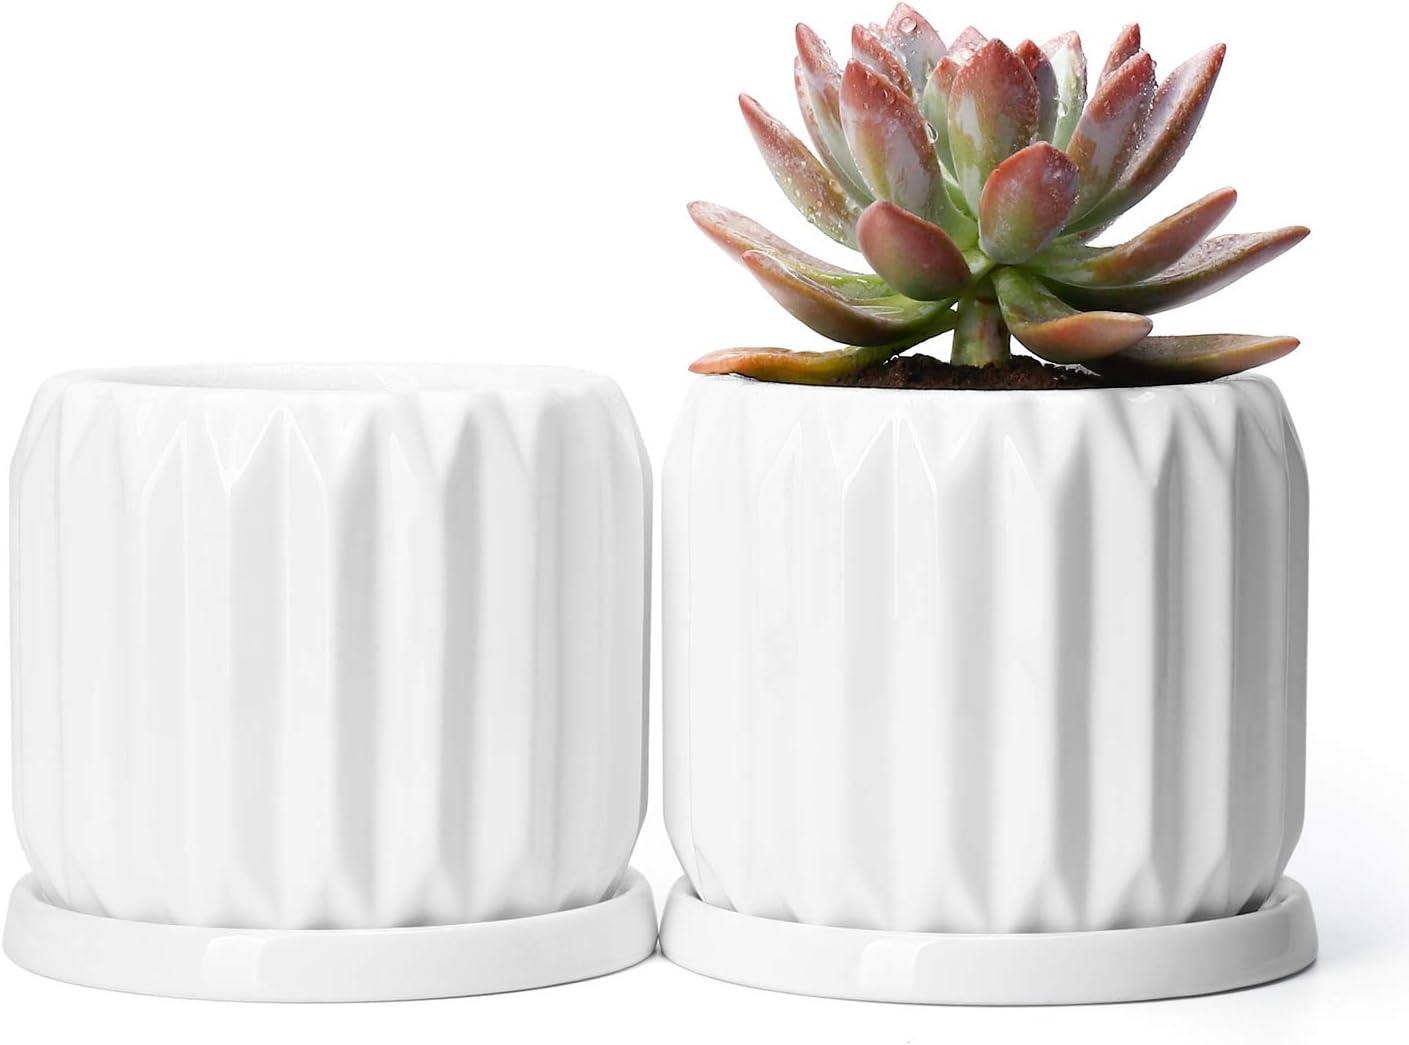 Potey Ceramic Plant Flower Pots Planters – 4.4 Medium Midcentury Planter with Drain Hole, Saucer Deco Indoor – Set of 2, Pure White, Mode 1